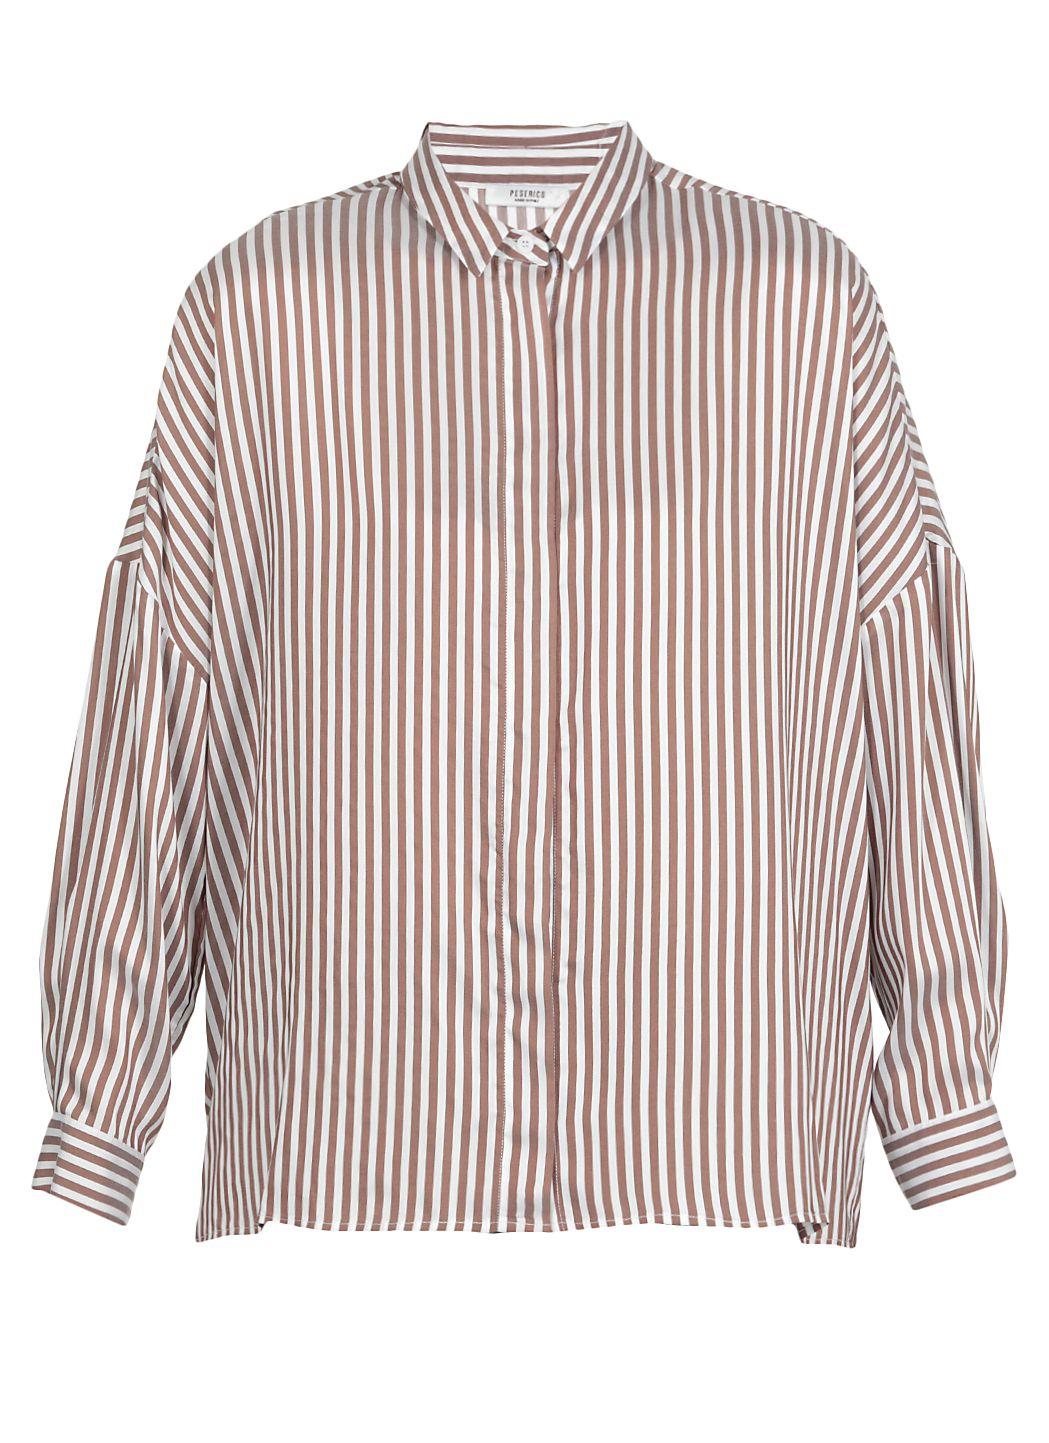 Silk and viscose blend striped shirt